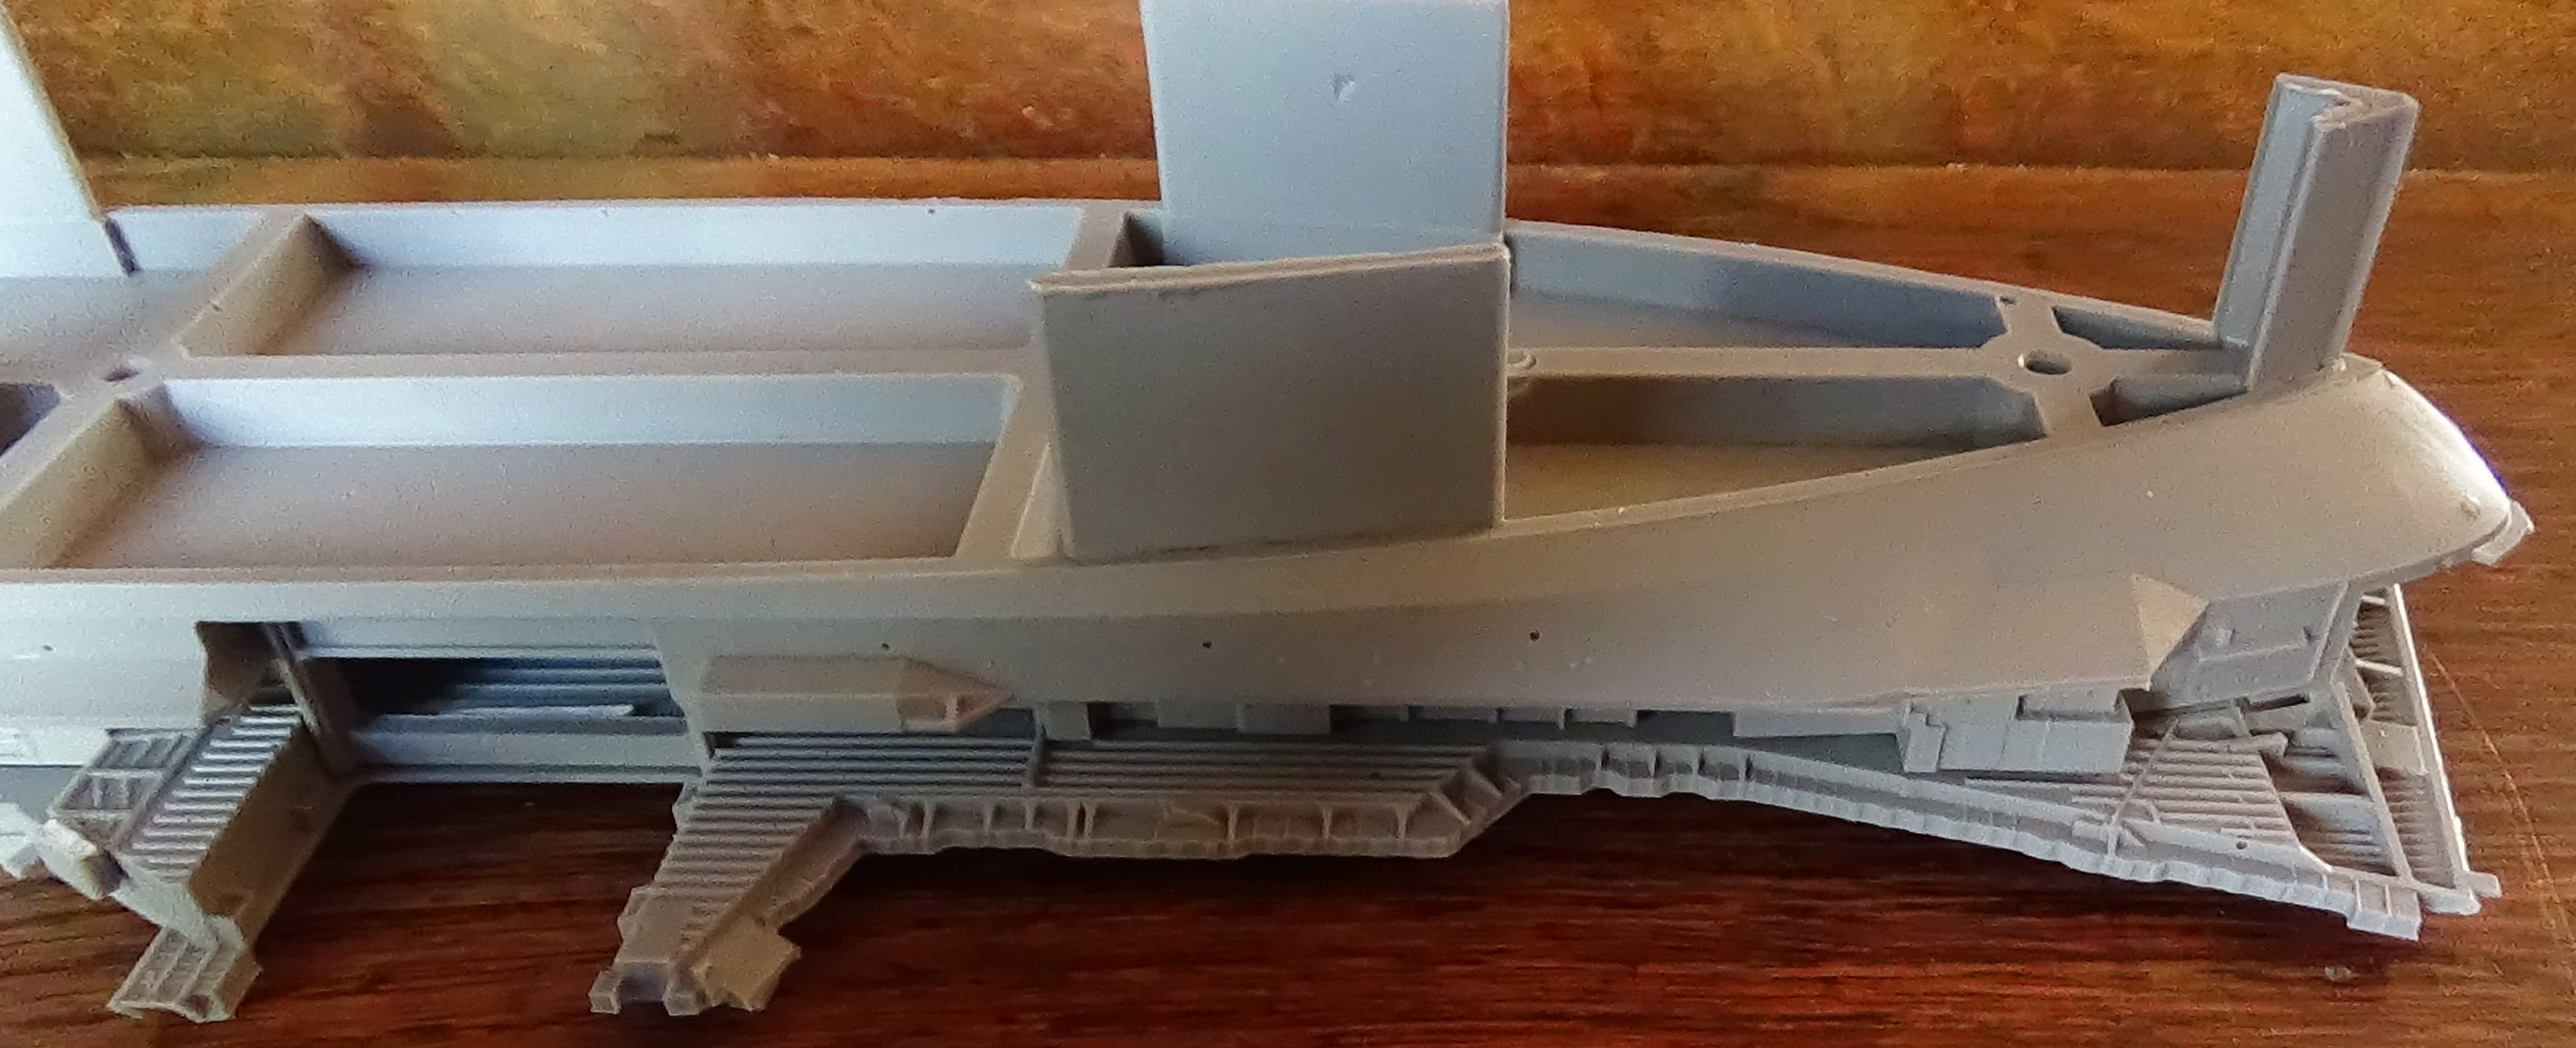 [USS Midway CVA-41] Porte avions lourd américain-700e-Orange Hobby 17071905025623134915155990